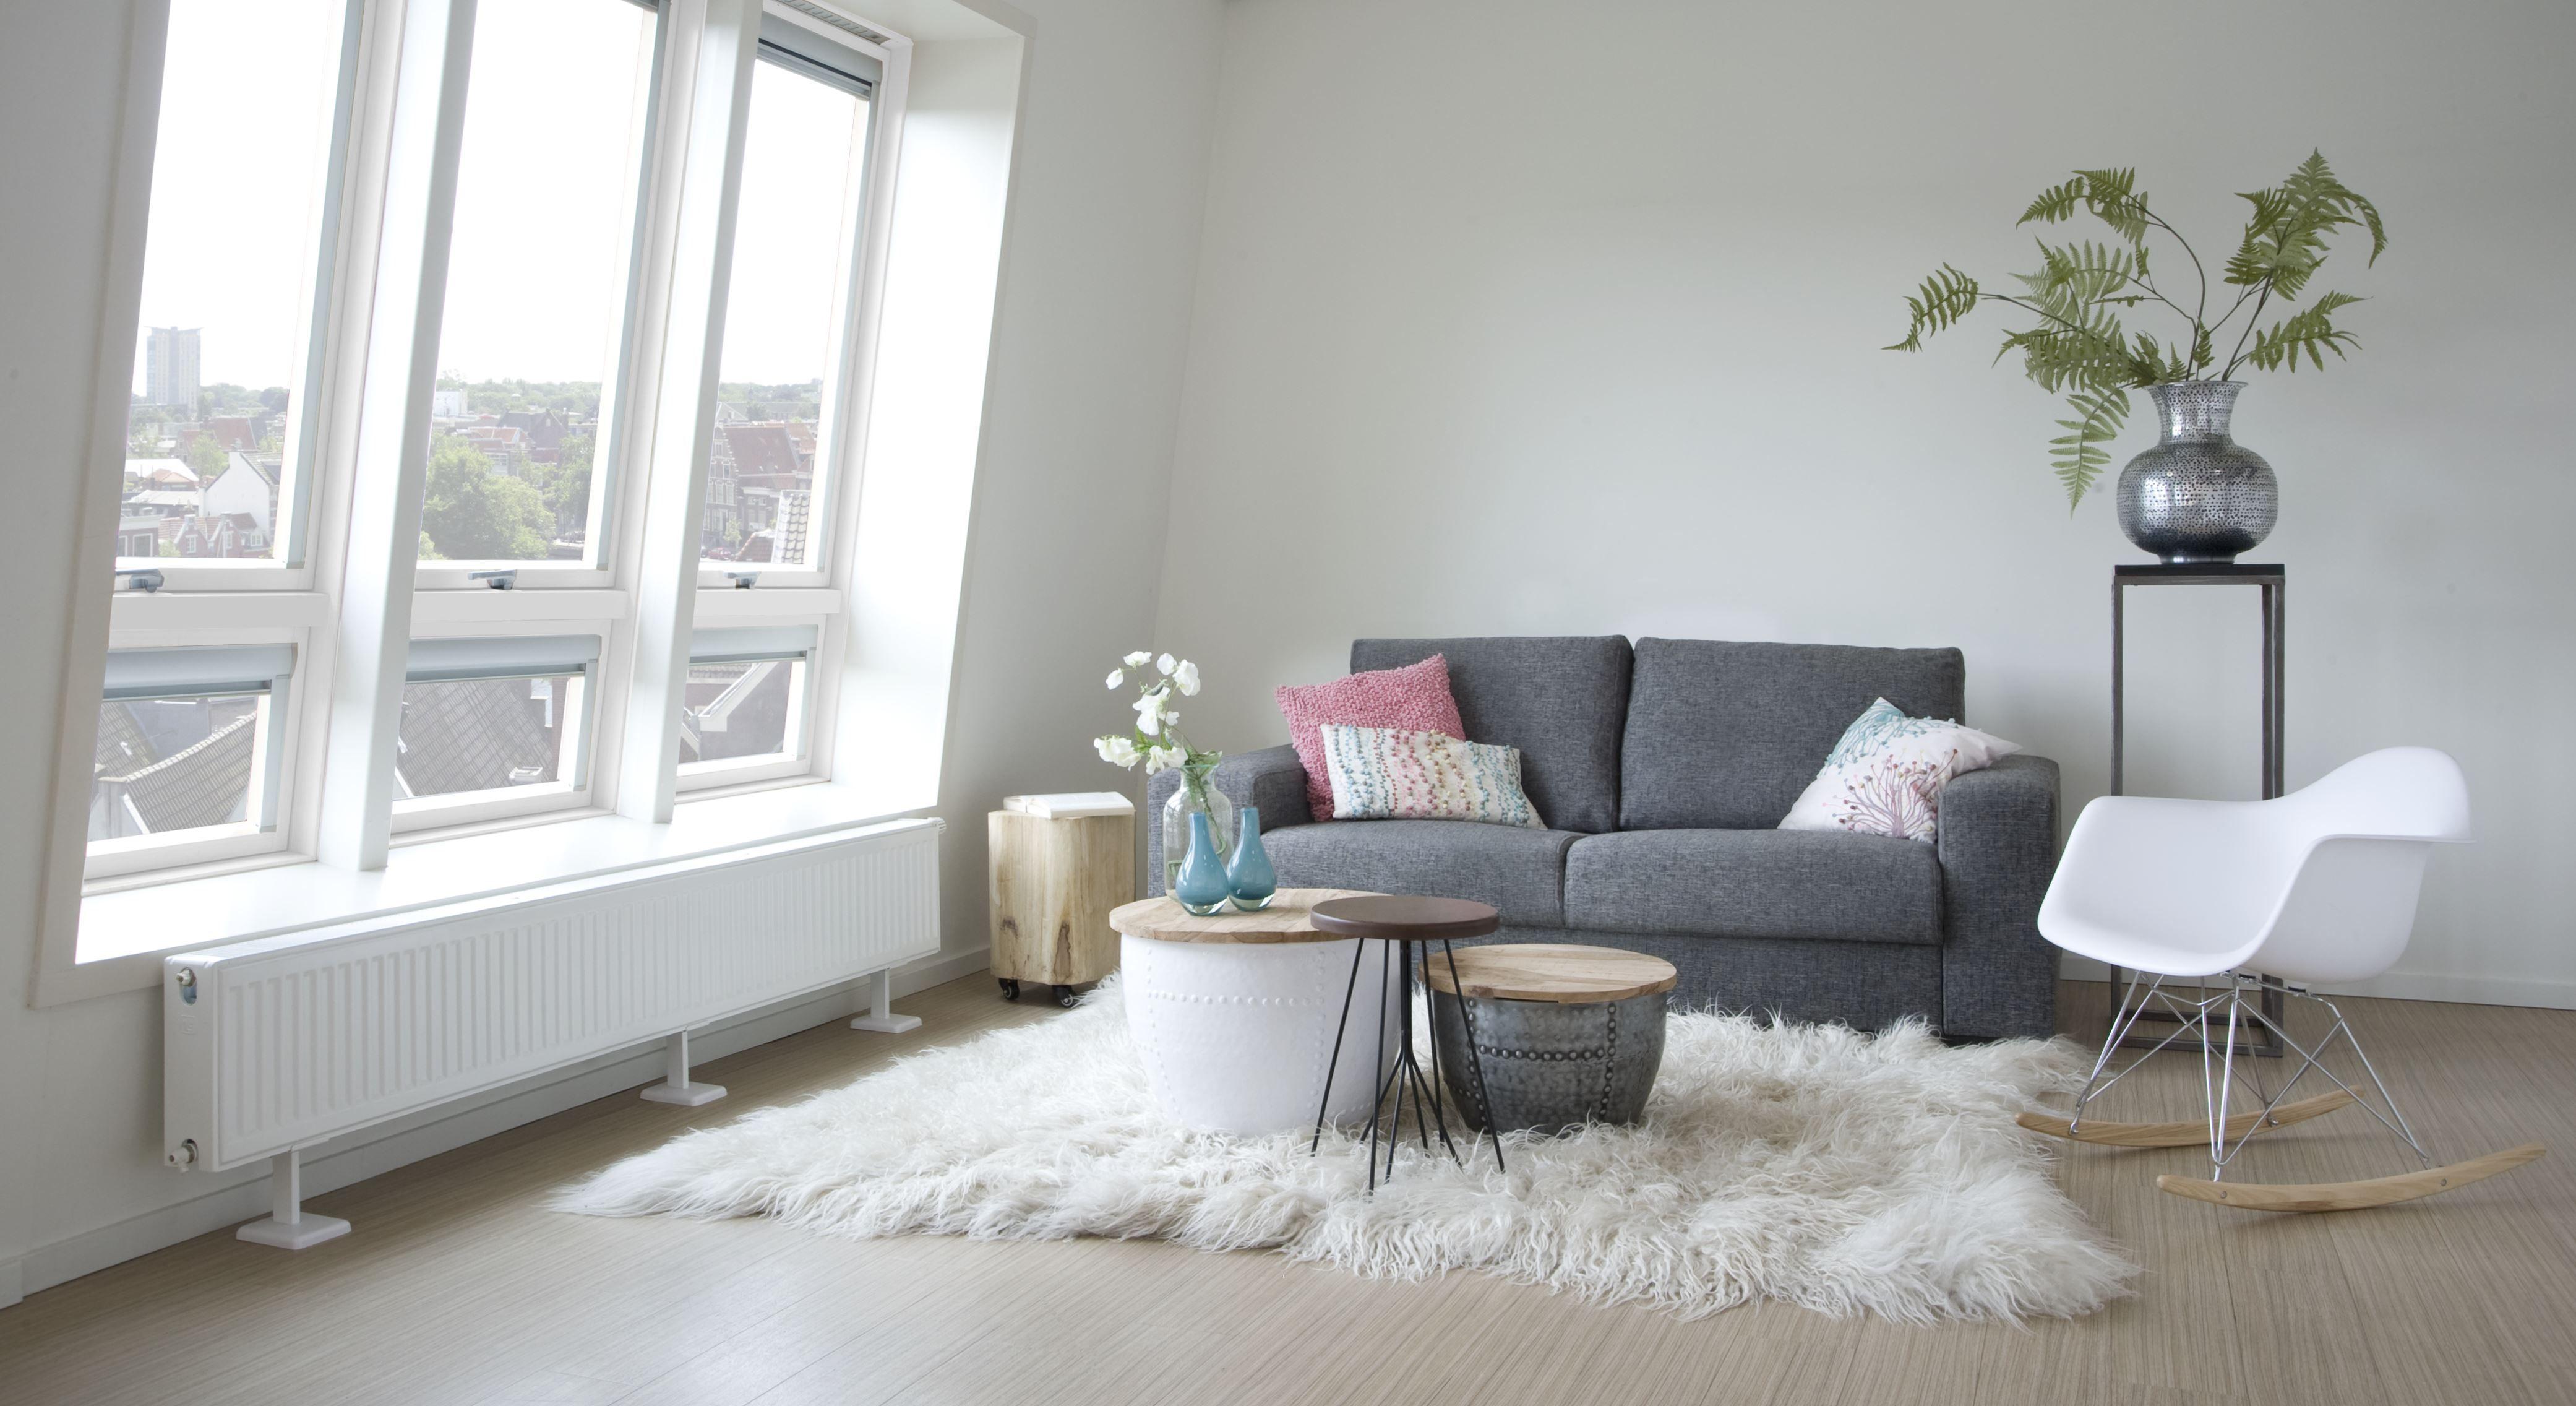 Moderne ruime woonkamer met een mooie lichtinval vanuit het dakraam